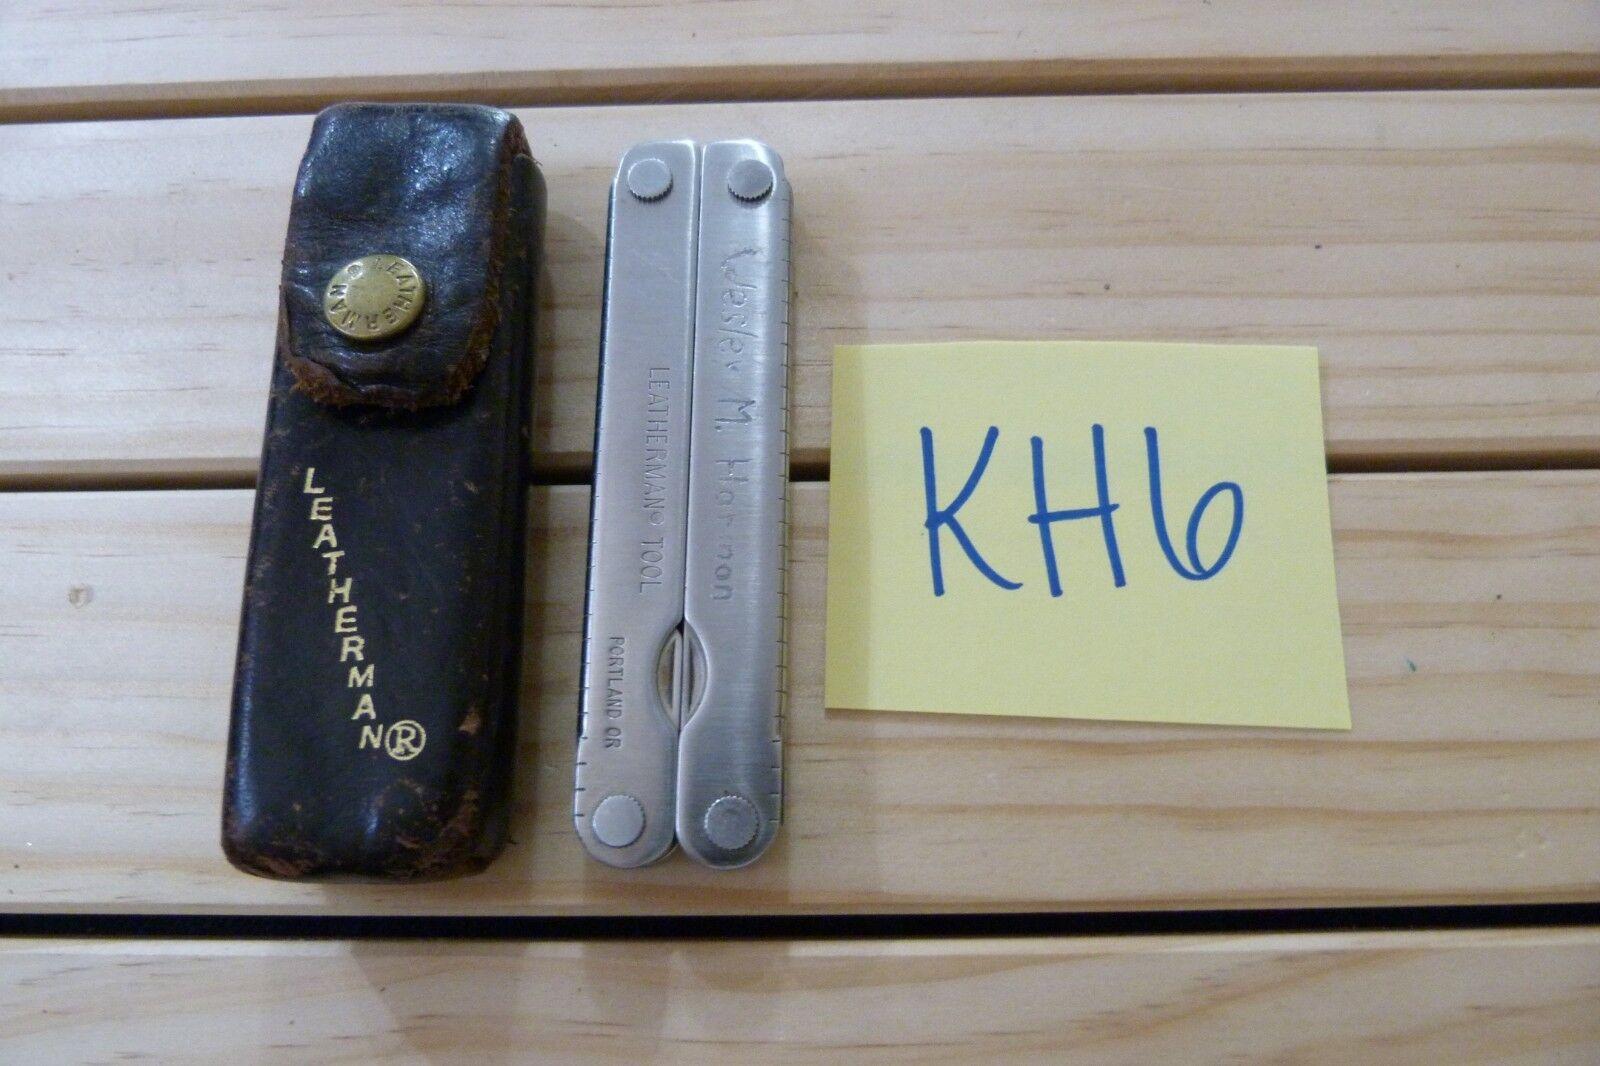 Leatherman Folding Multi Tool Knife  PST & LEATHER  SHEATH -KH  big discount prices